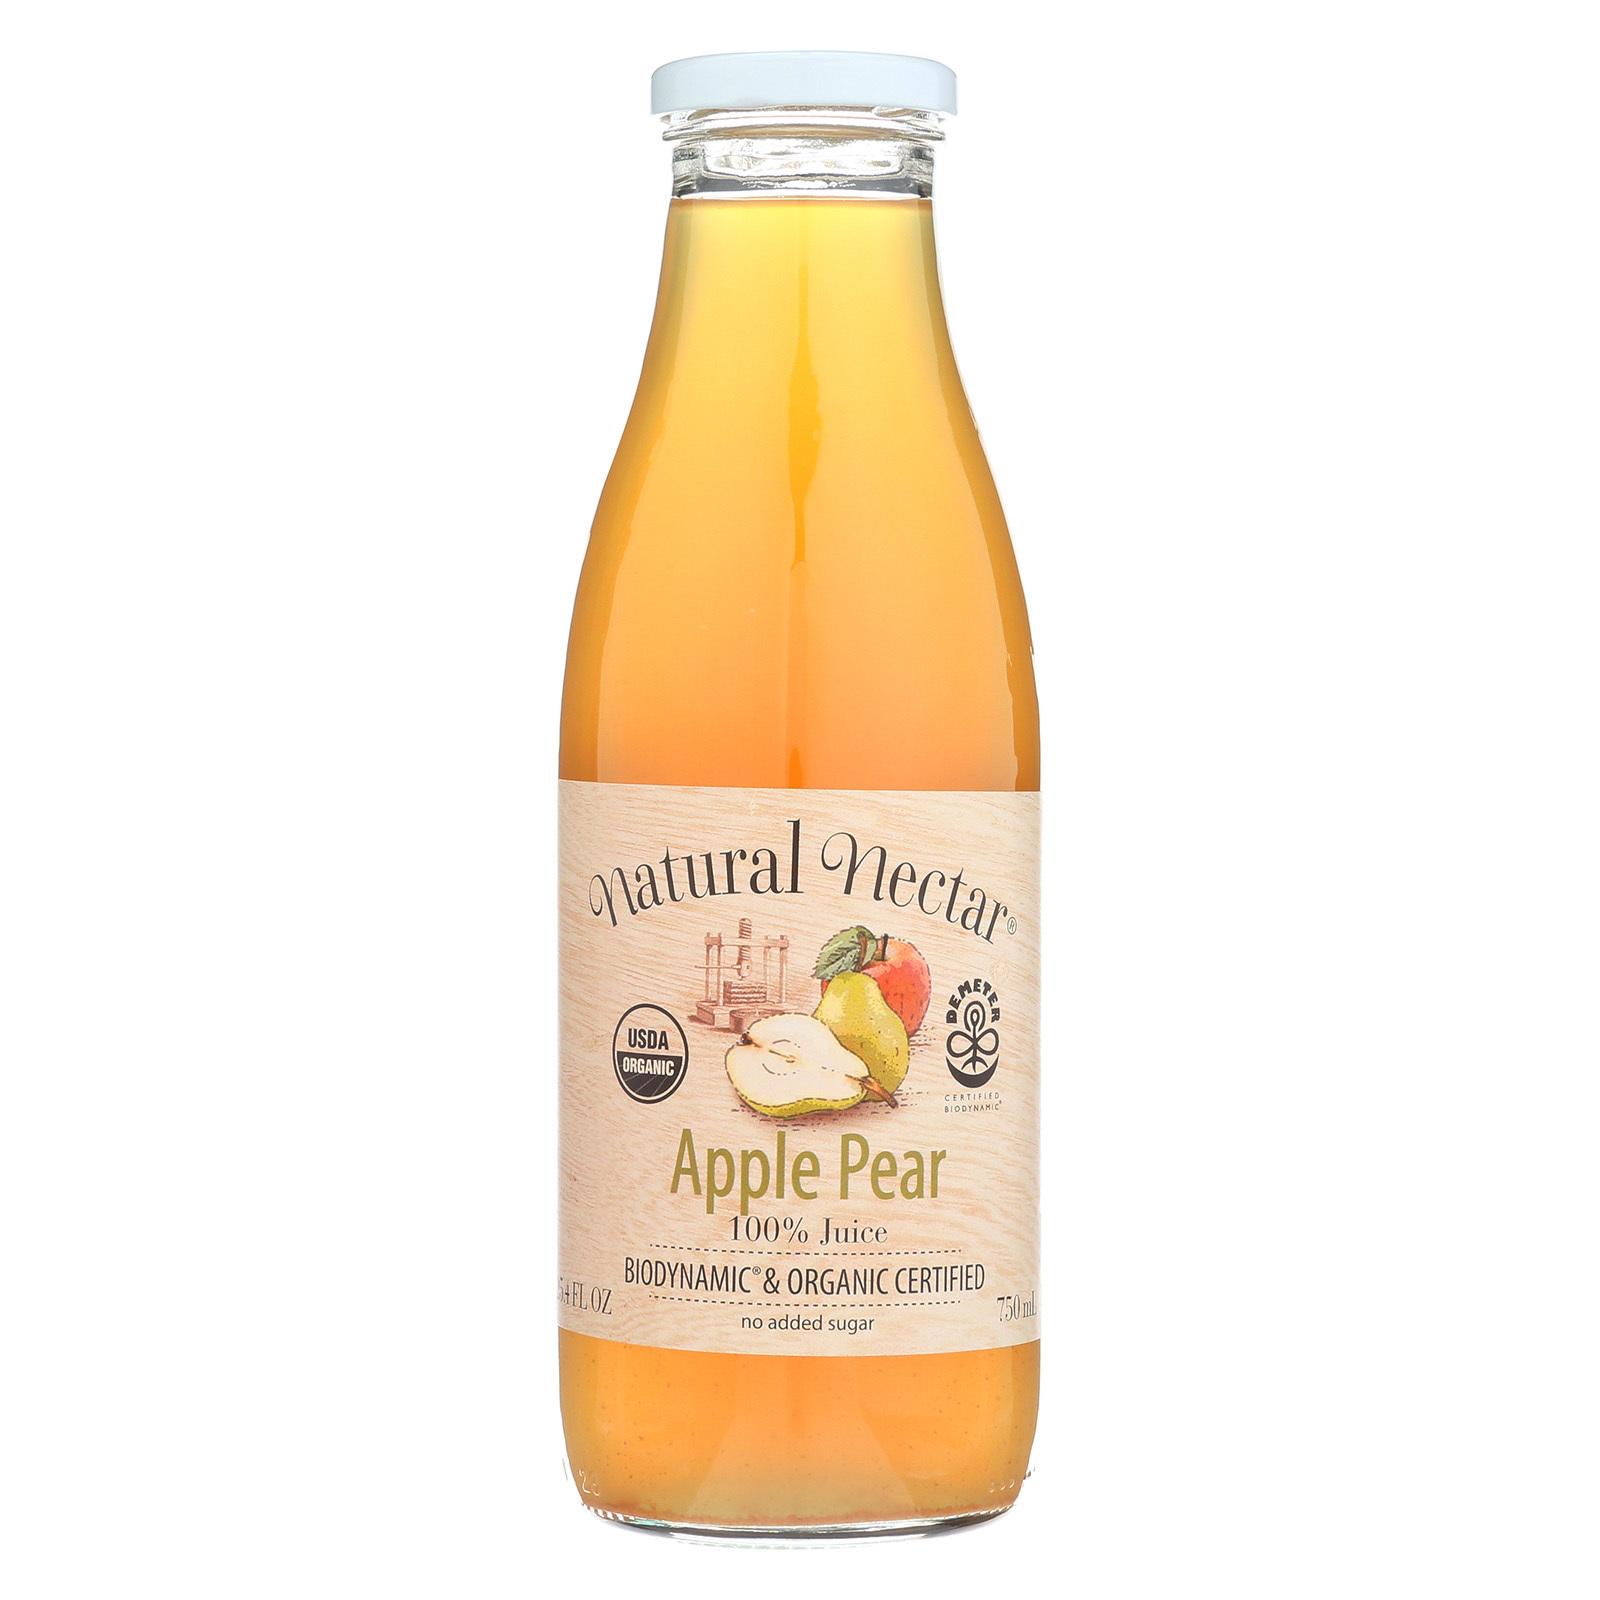 Natural Nectar Fruit Juices - Apple Pear - Case of 6 - 25.4 Fl oz.